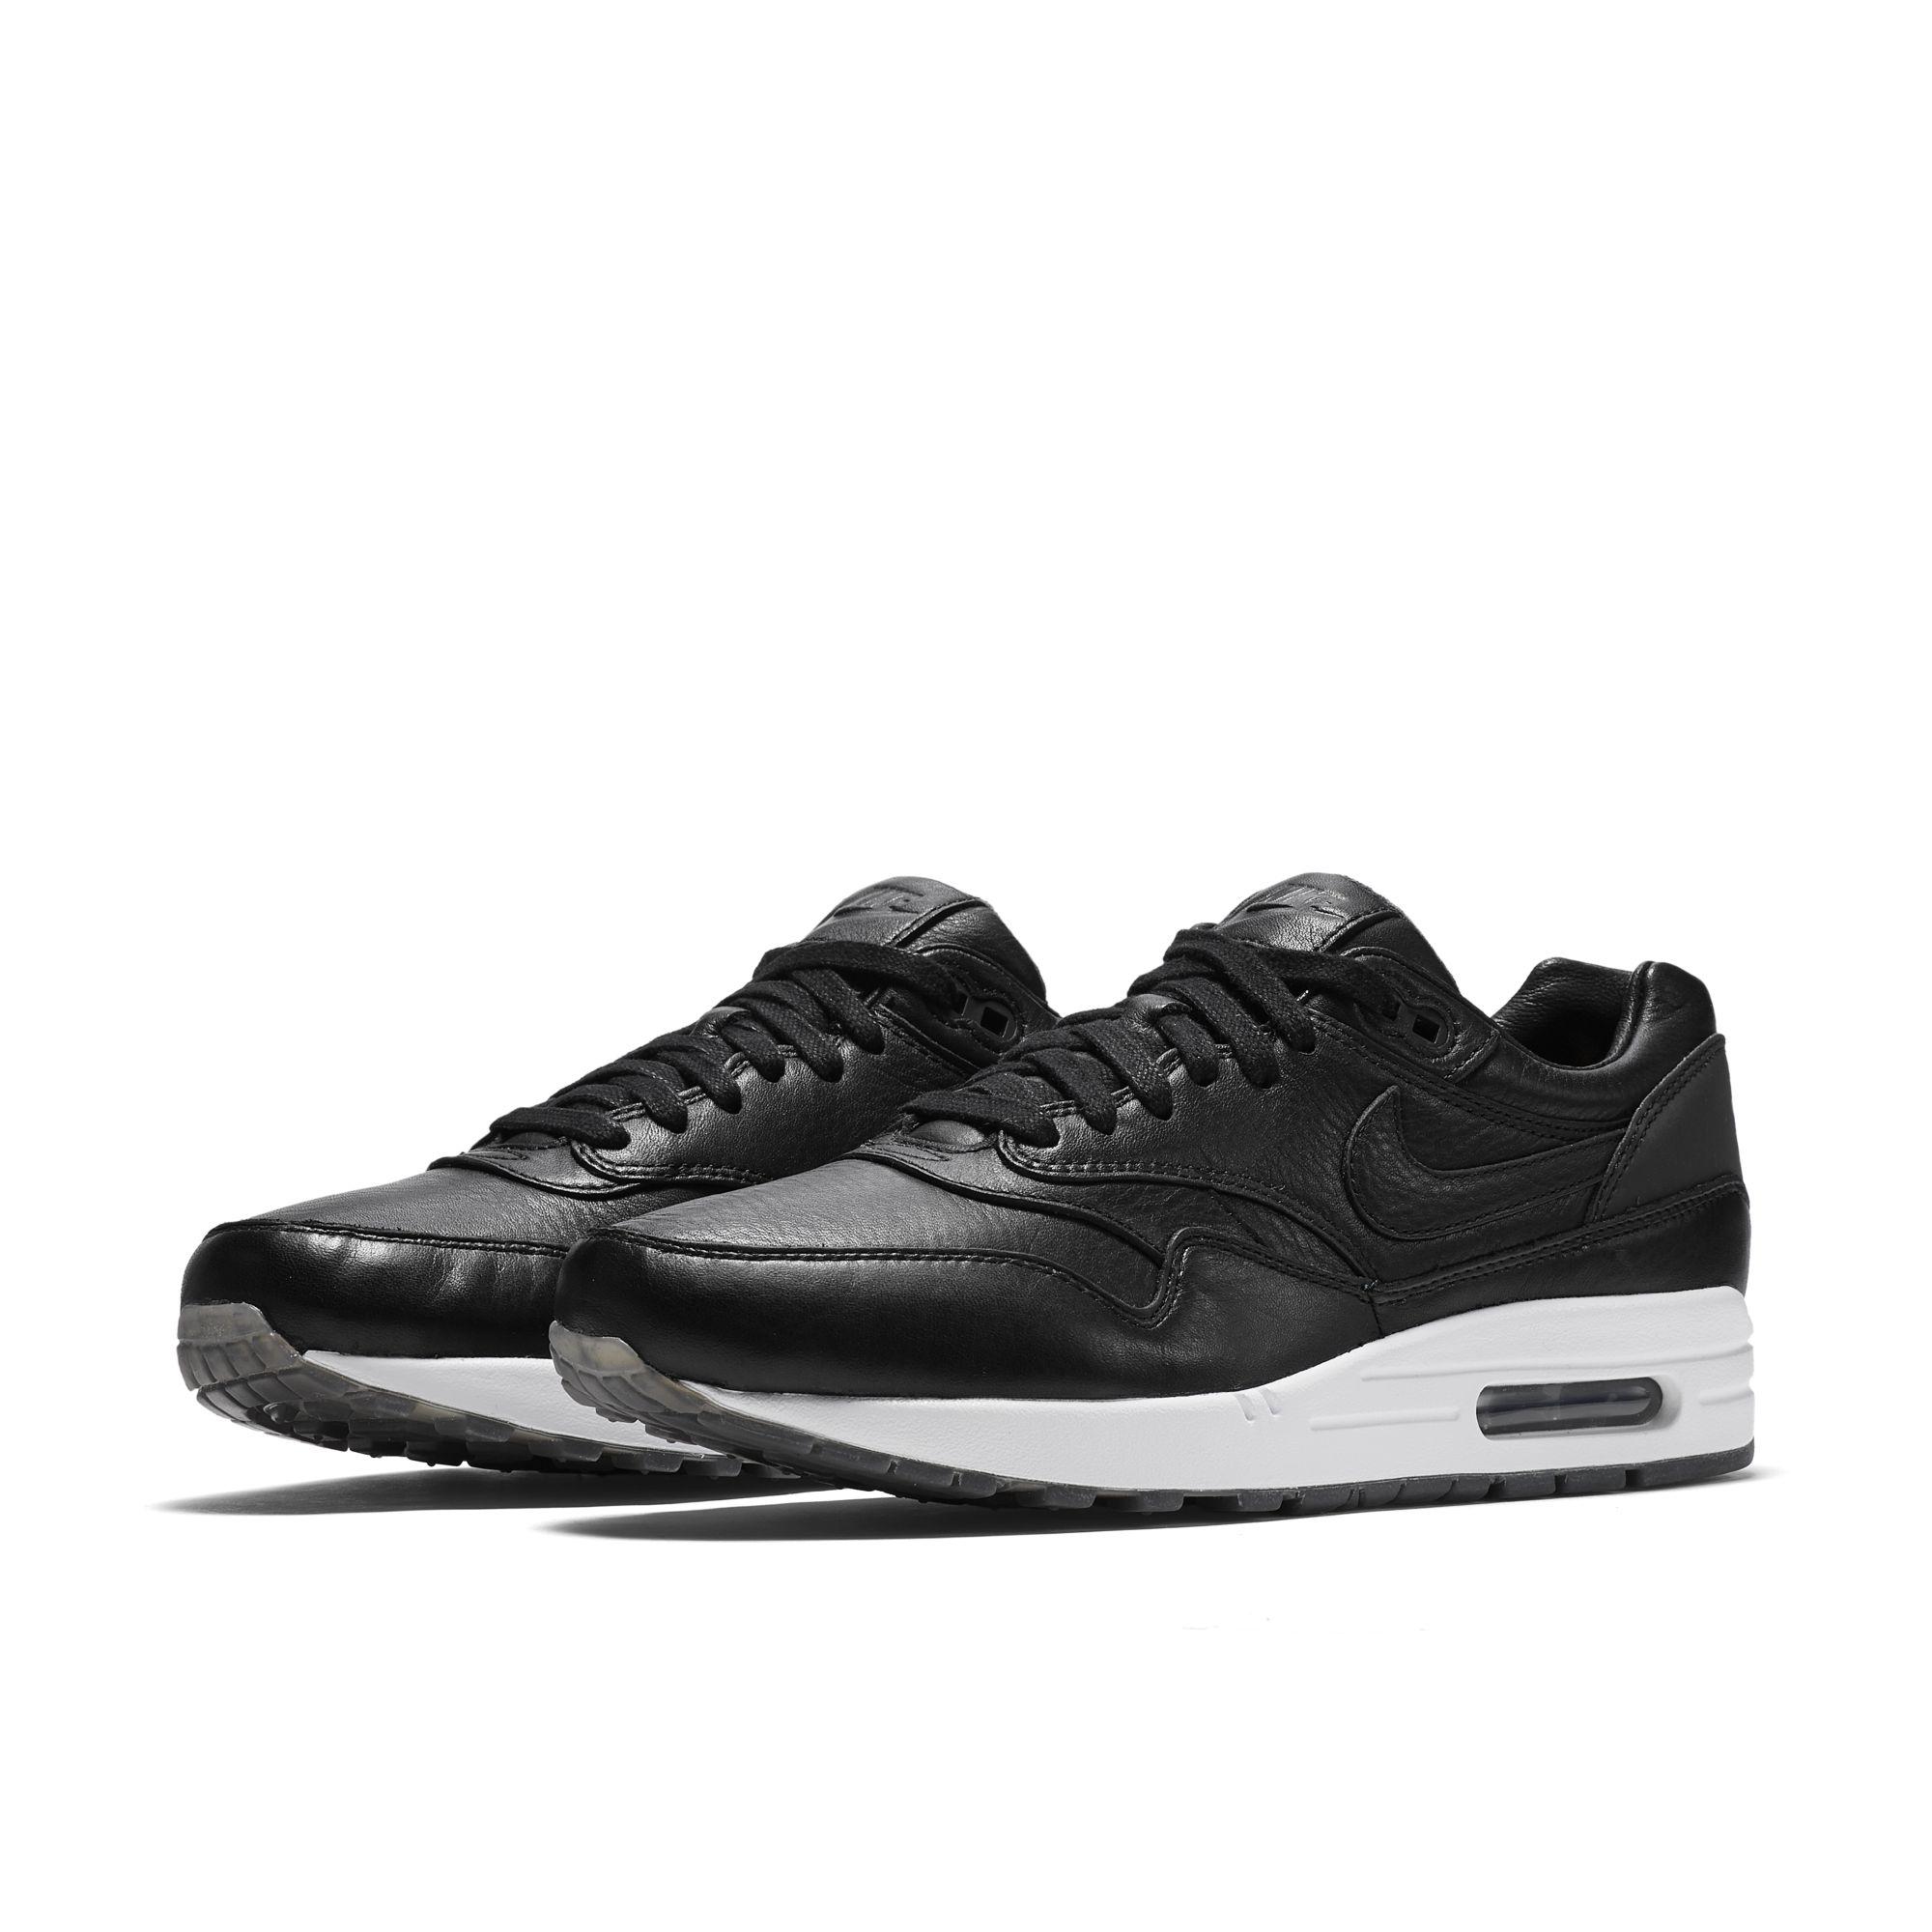 High end Product Nike Air Max Thea Pinnacle Leather Black